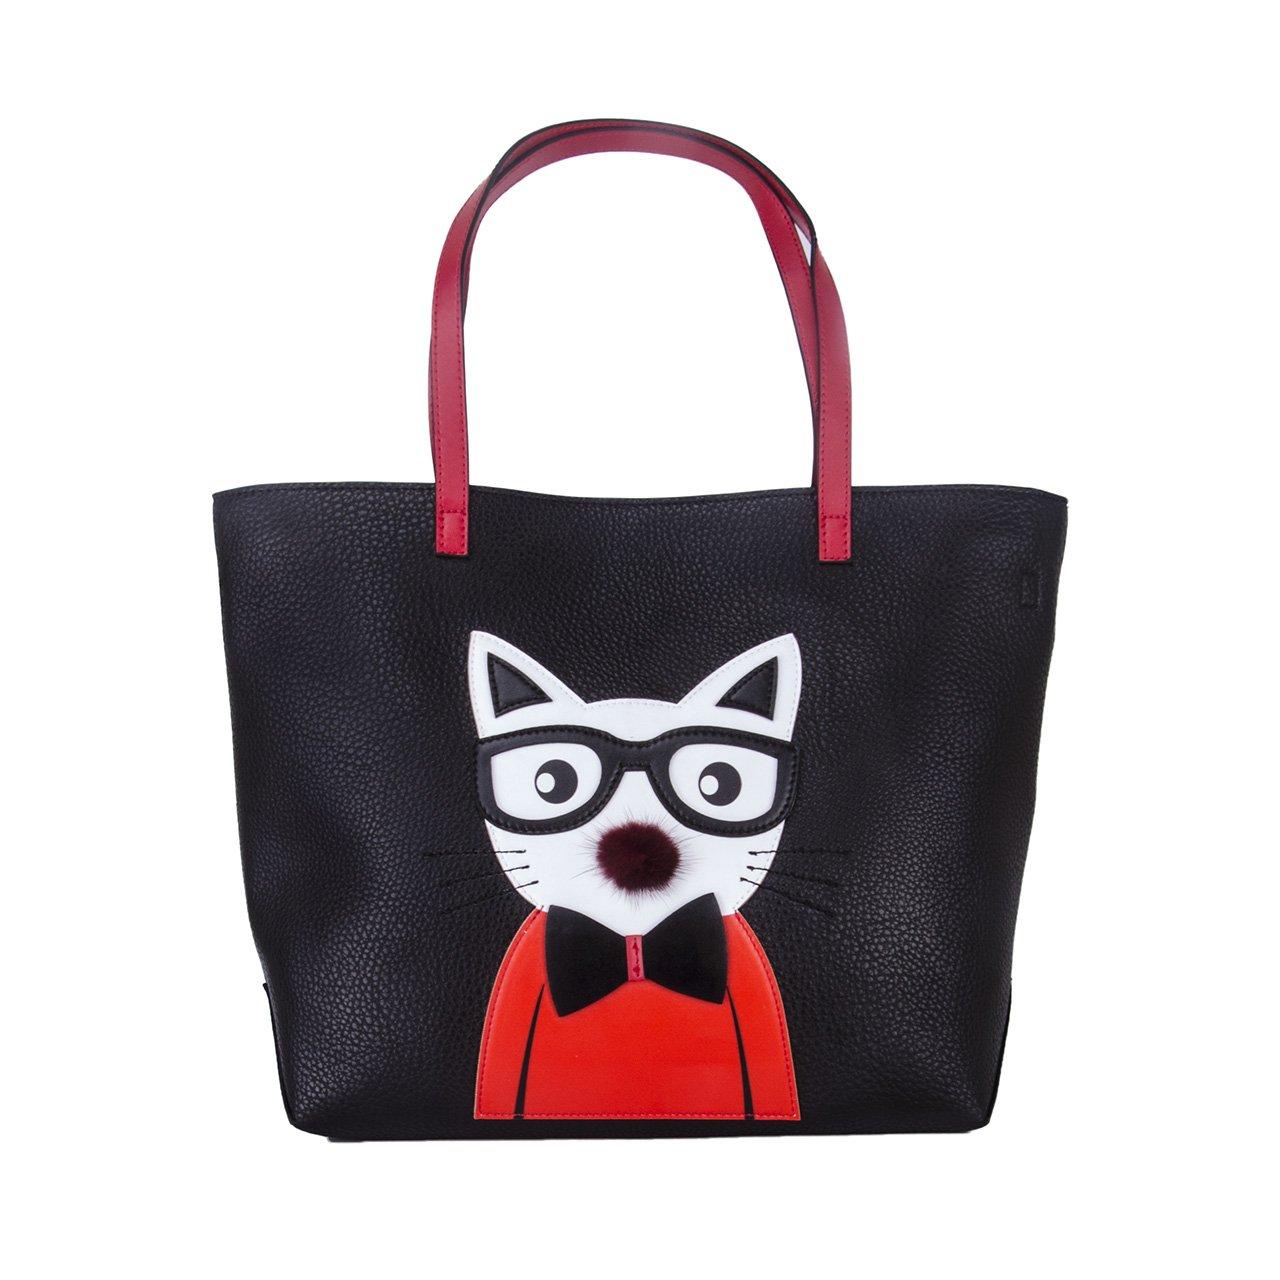 Cat Tote Bag for Women Leather Handbag Cute Crossbody Fashion Purse  Shoulder Bag Black Small by QIANBH  Amazon.in  Shoes   Handbags de7770ee0a505